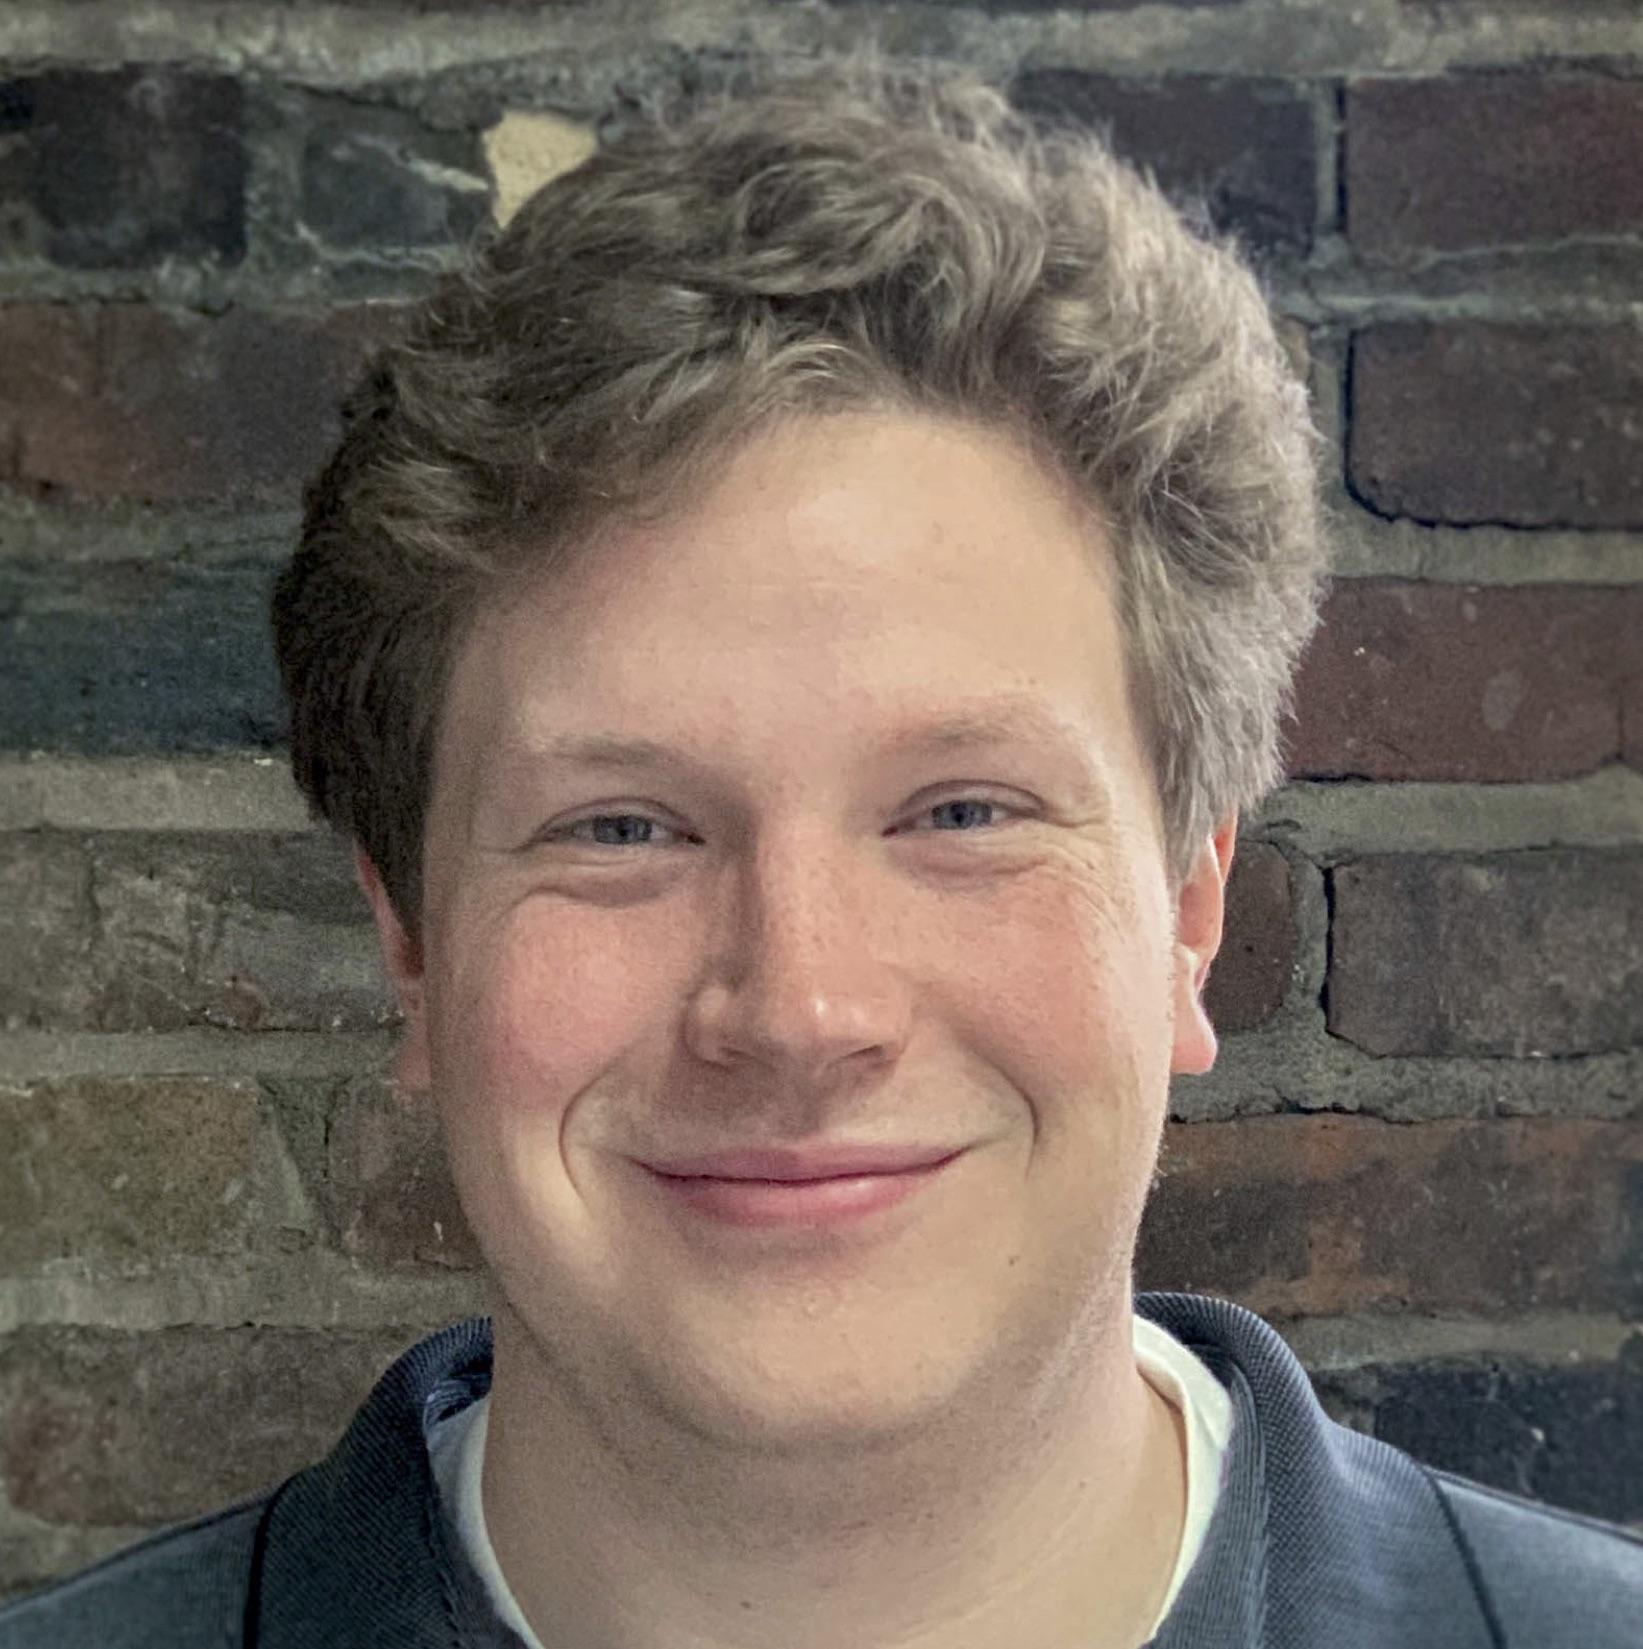 Awesome Inc team member, Samuel Hartman